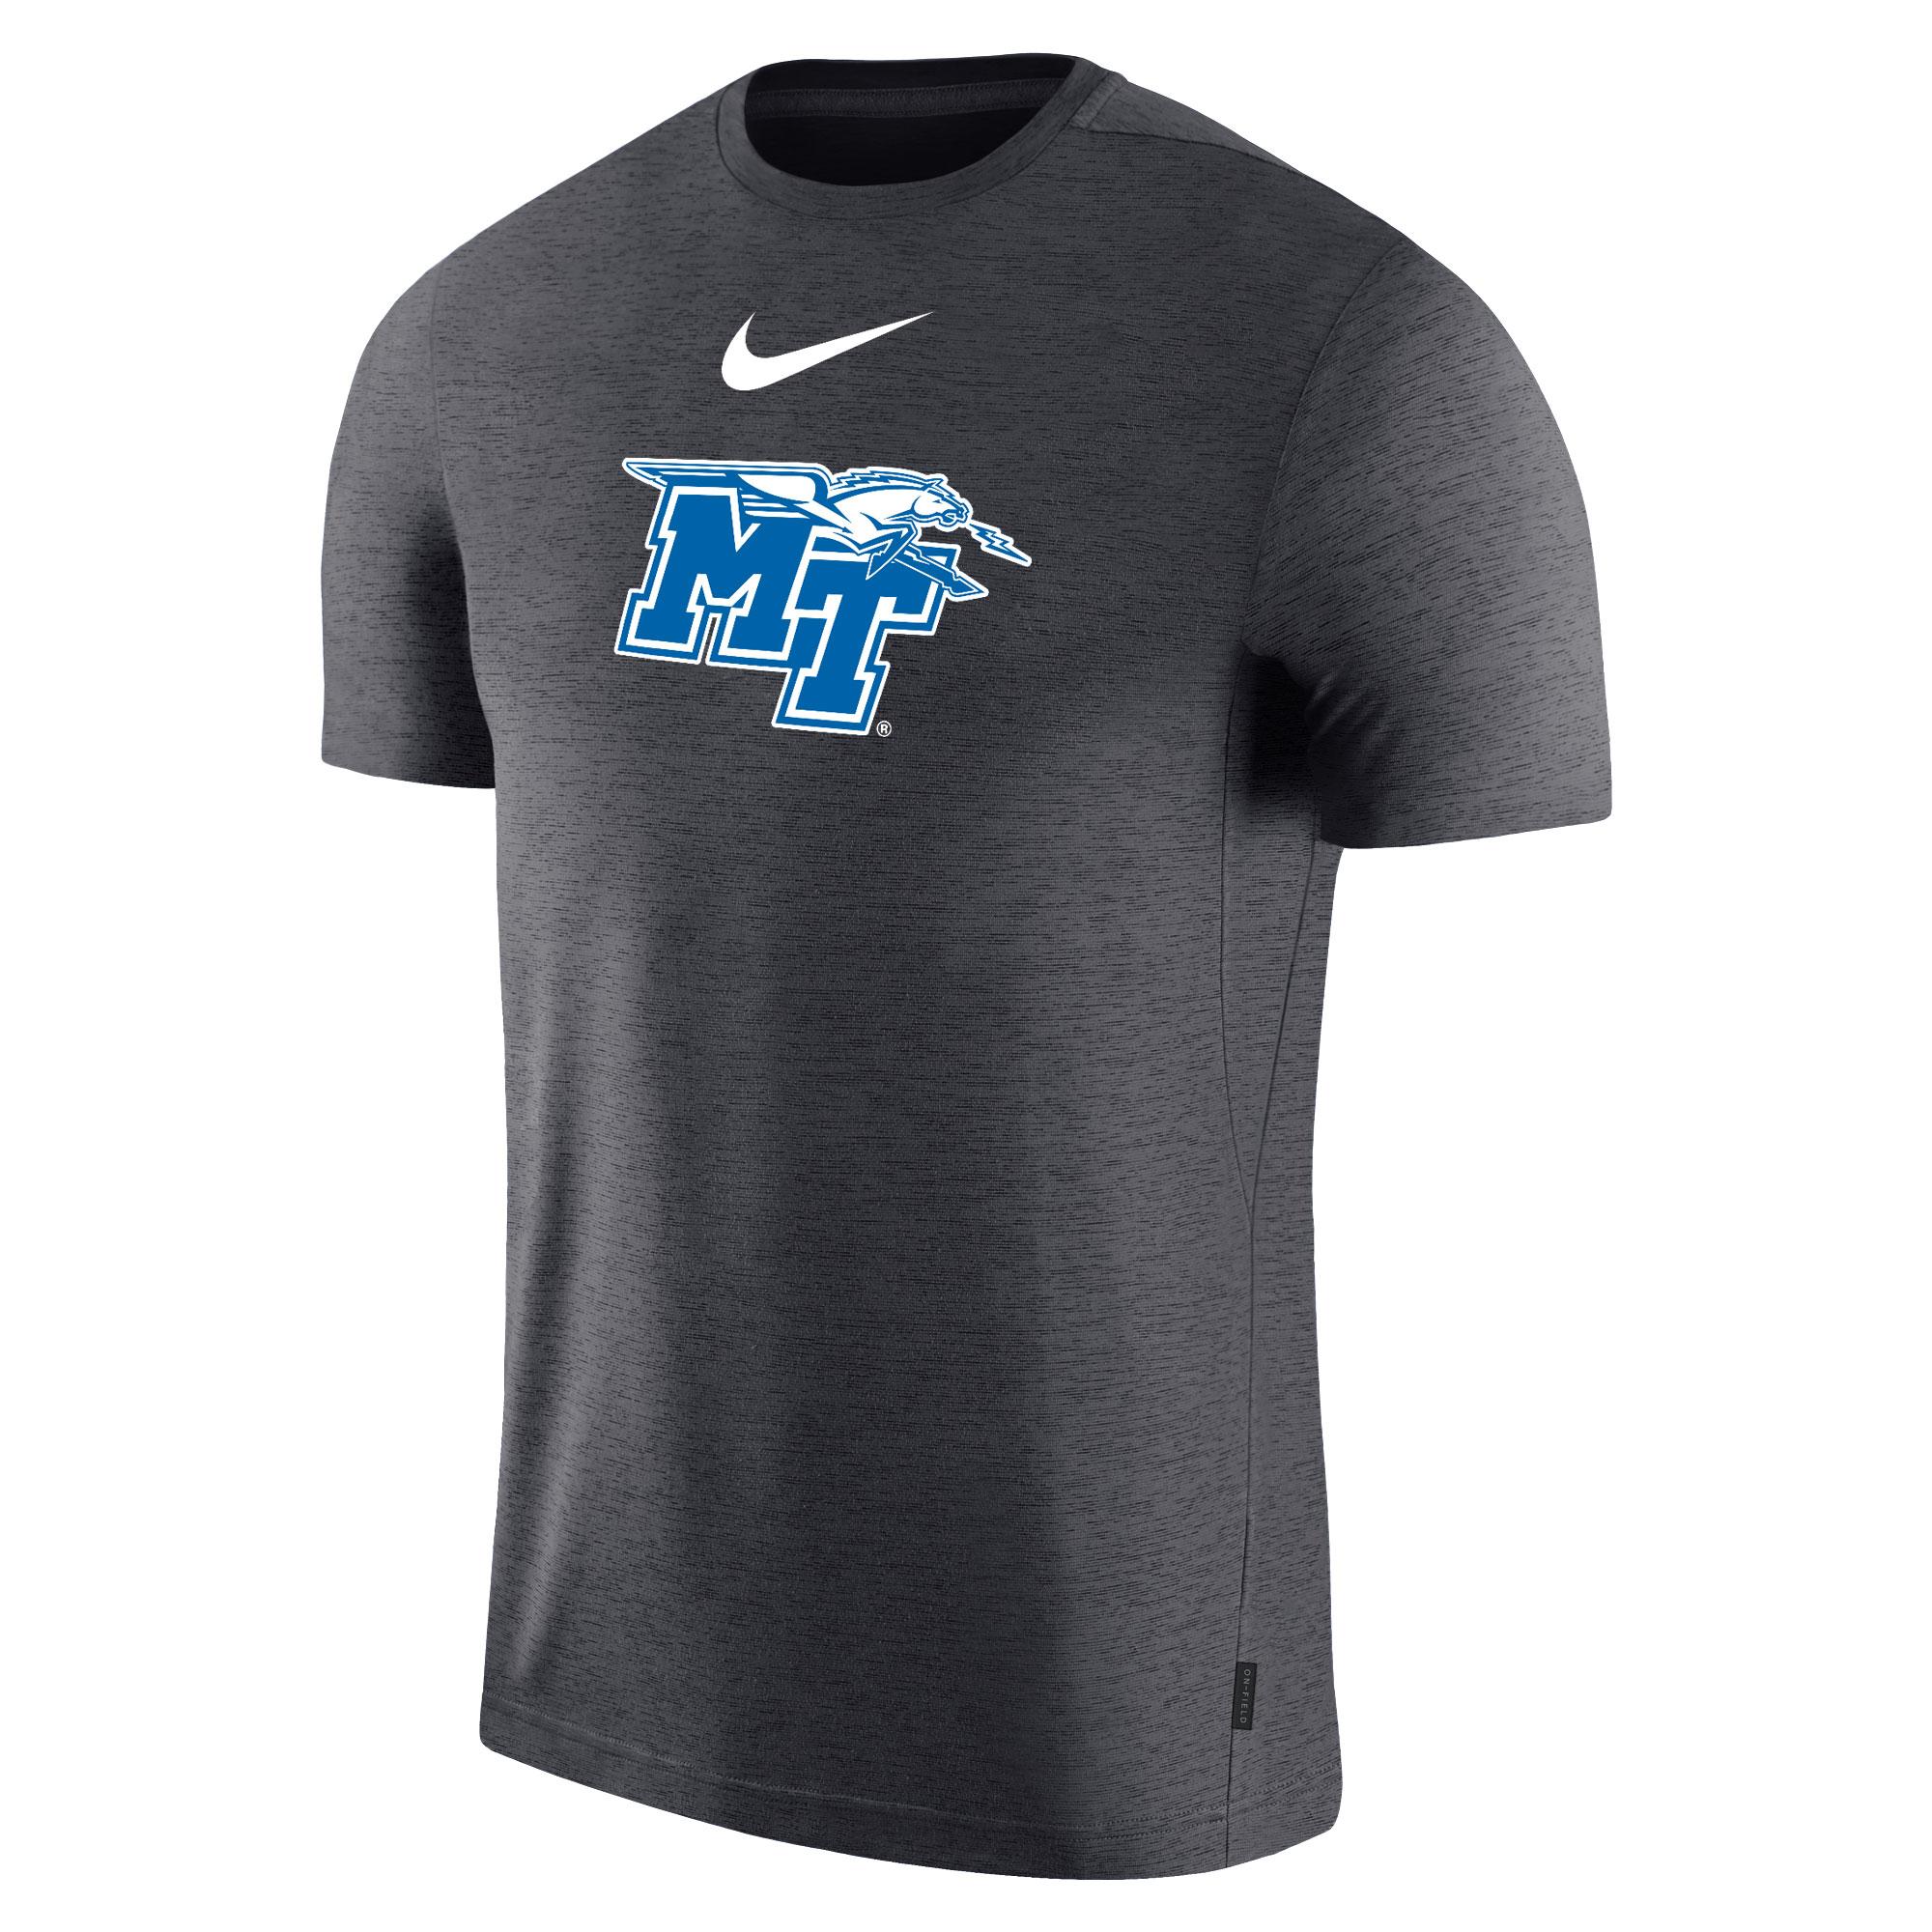 MT Logo w/ Lightning Nike® Sideline Coach Shirt